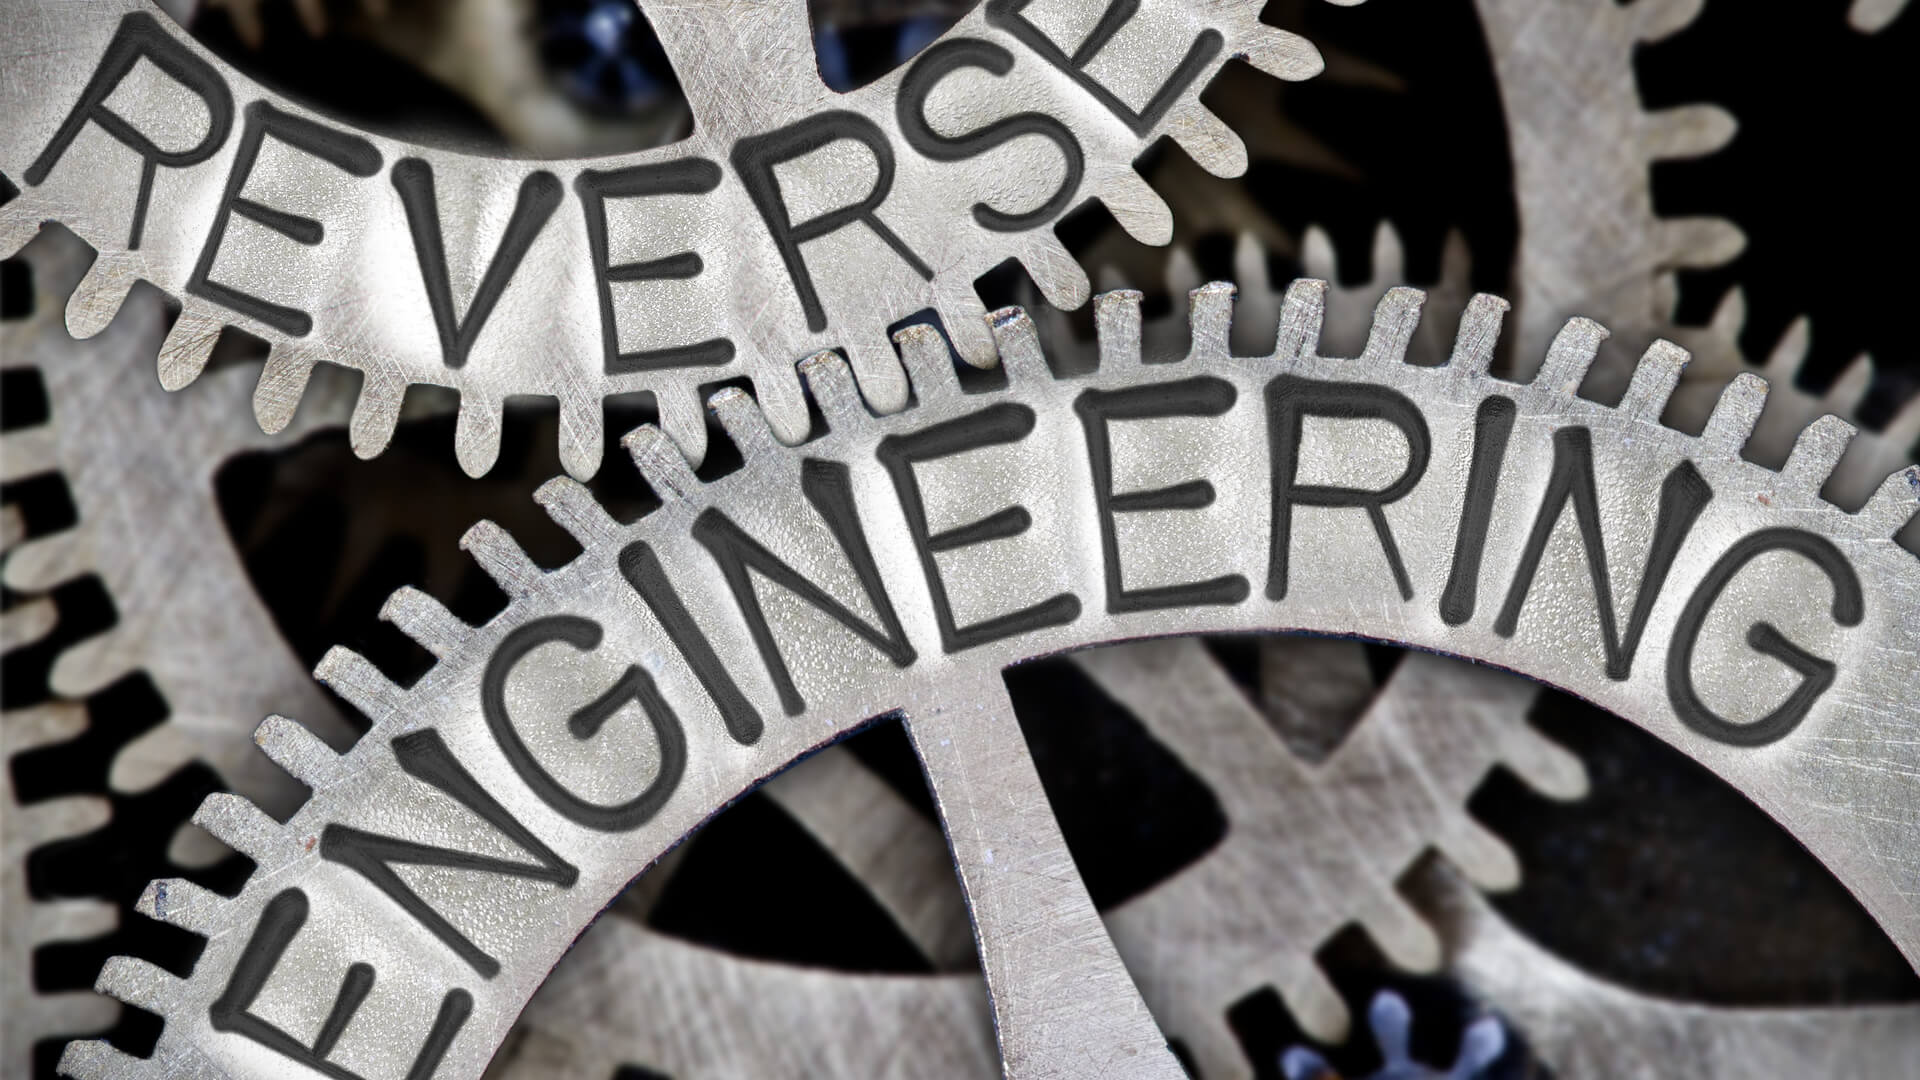 reverse engineering - retoolkit: Εργαλειοθήκη για Reverse Engineering